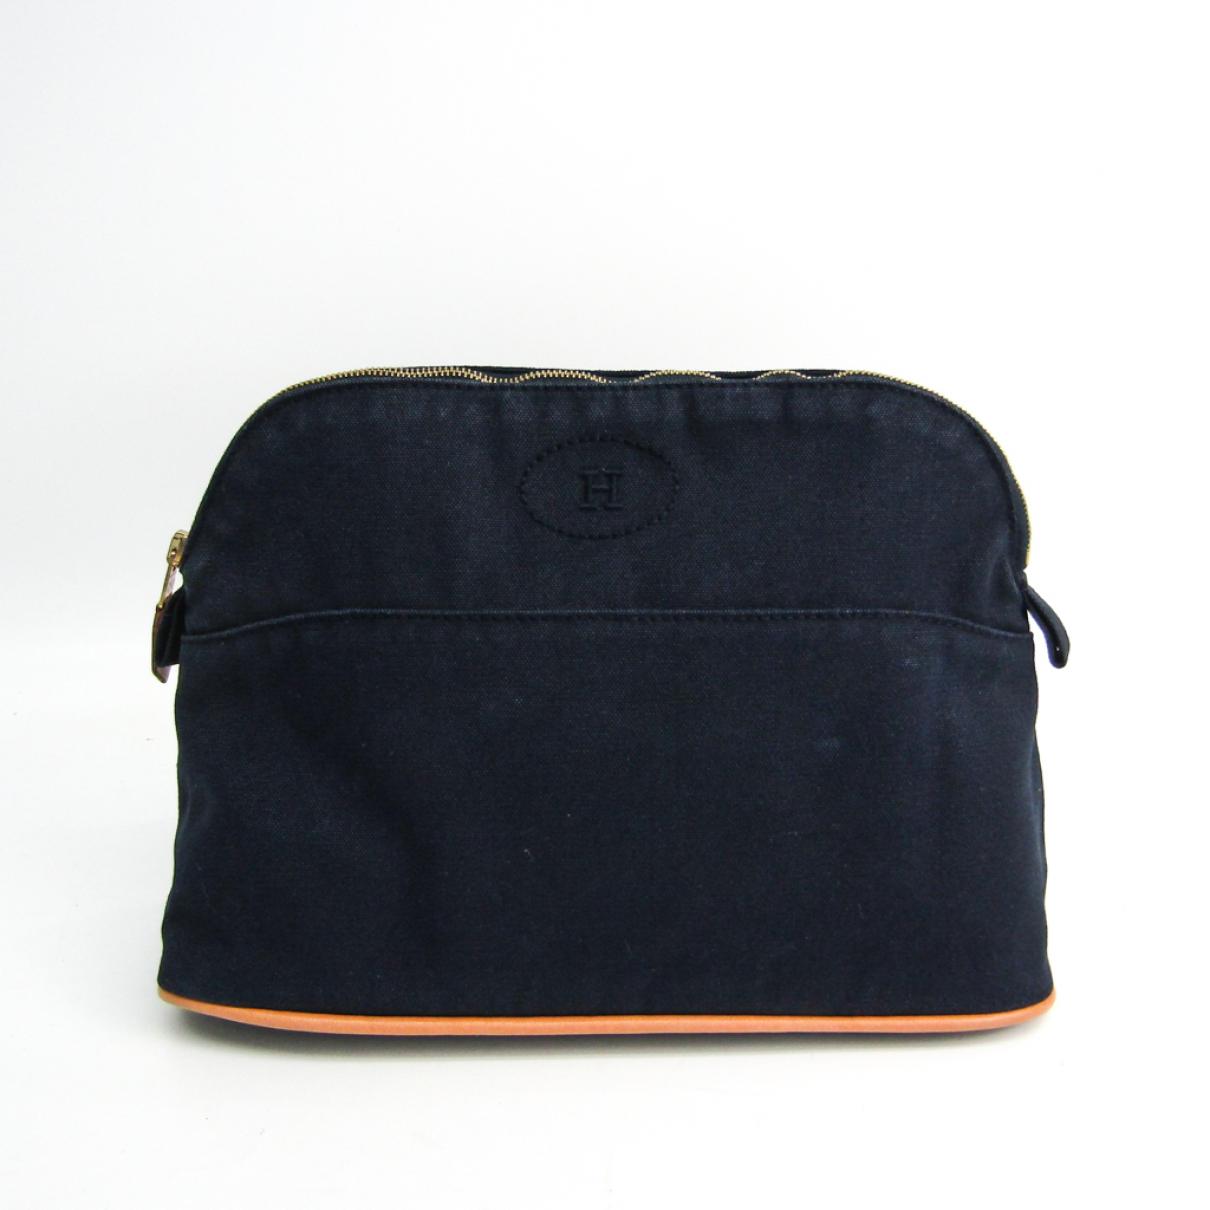 Hermès Bolide Navy Cotton handbag for Women N